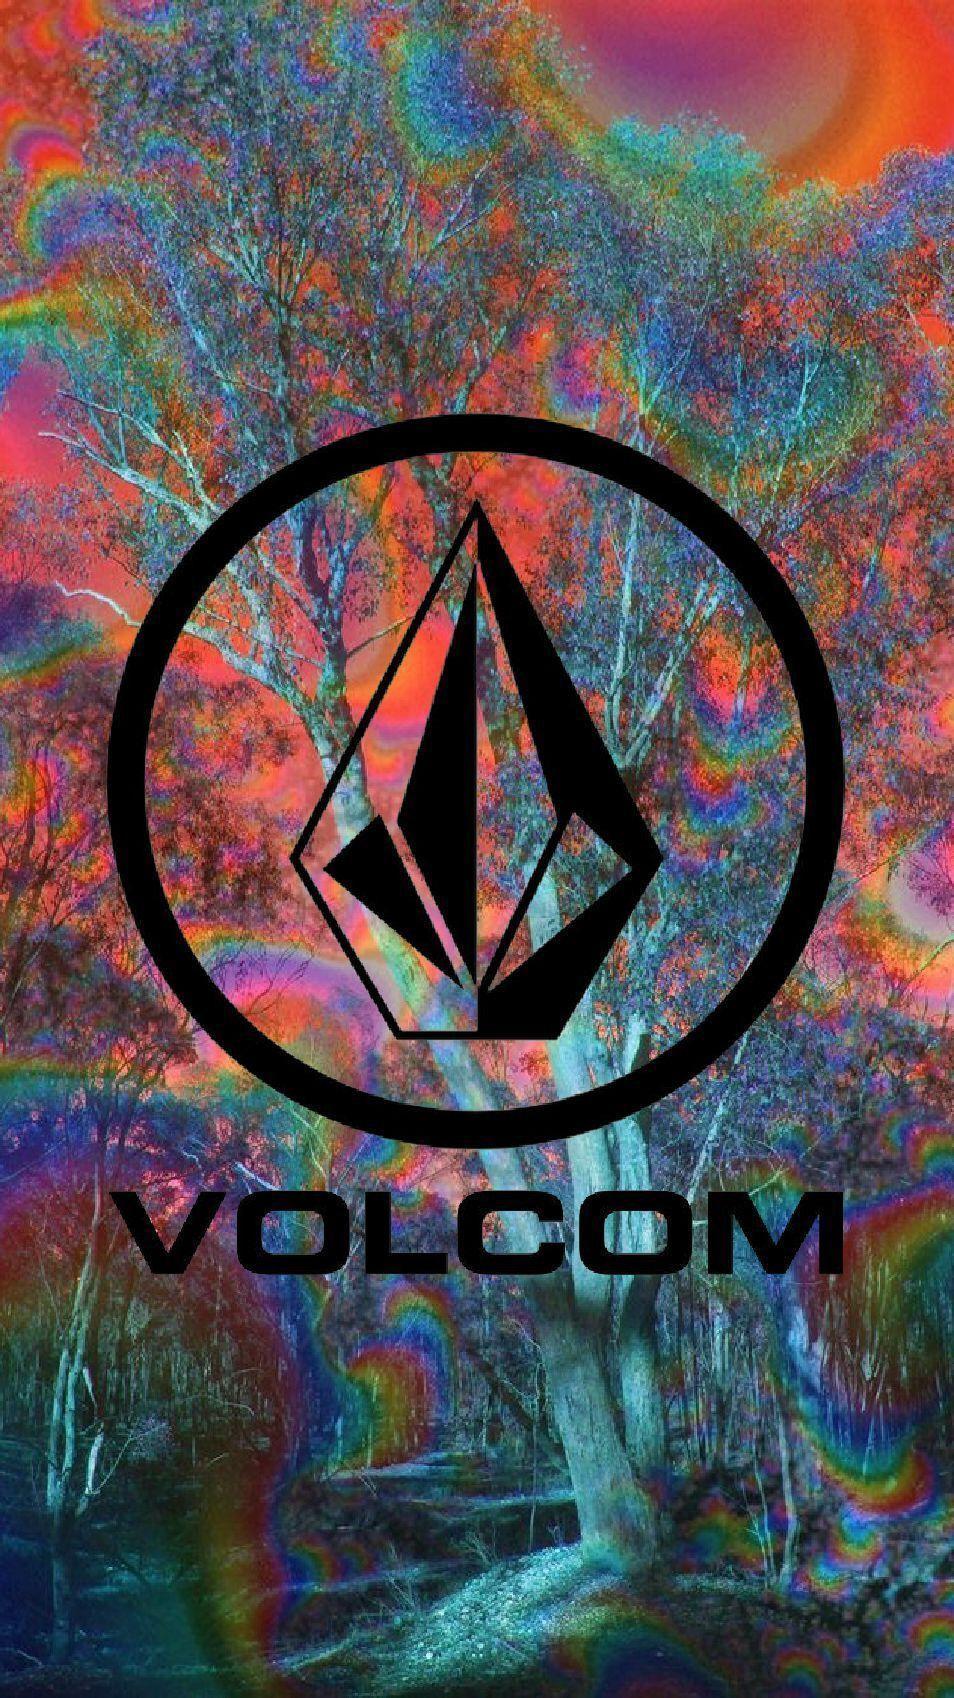 Volcom iPhone Wallpapers - Top Free Volcom iPhone ...